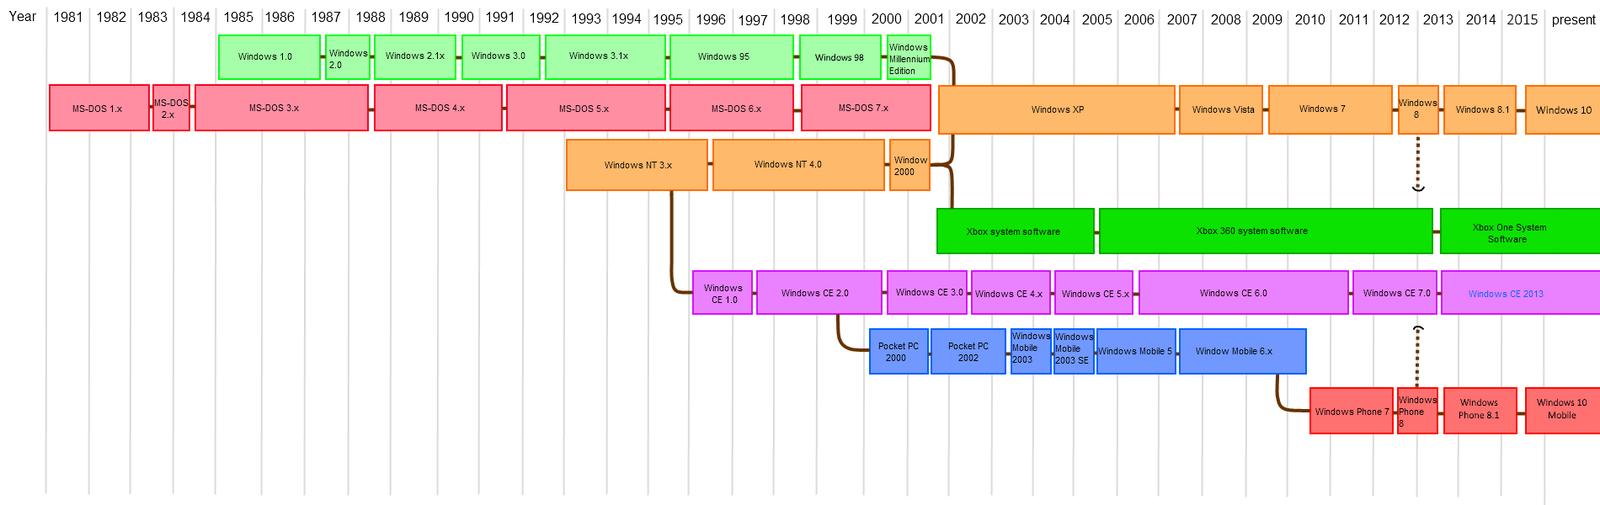 List of Microsoft Windows versions - Wikipedia